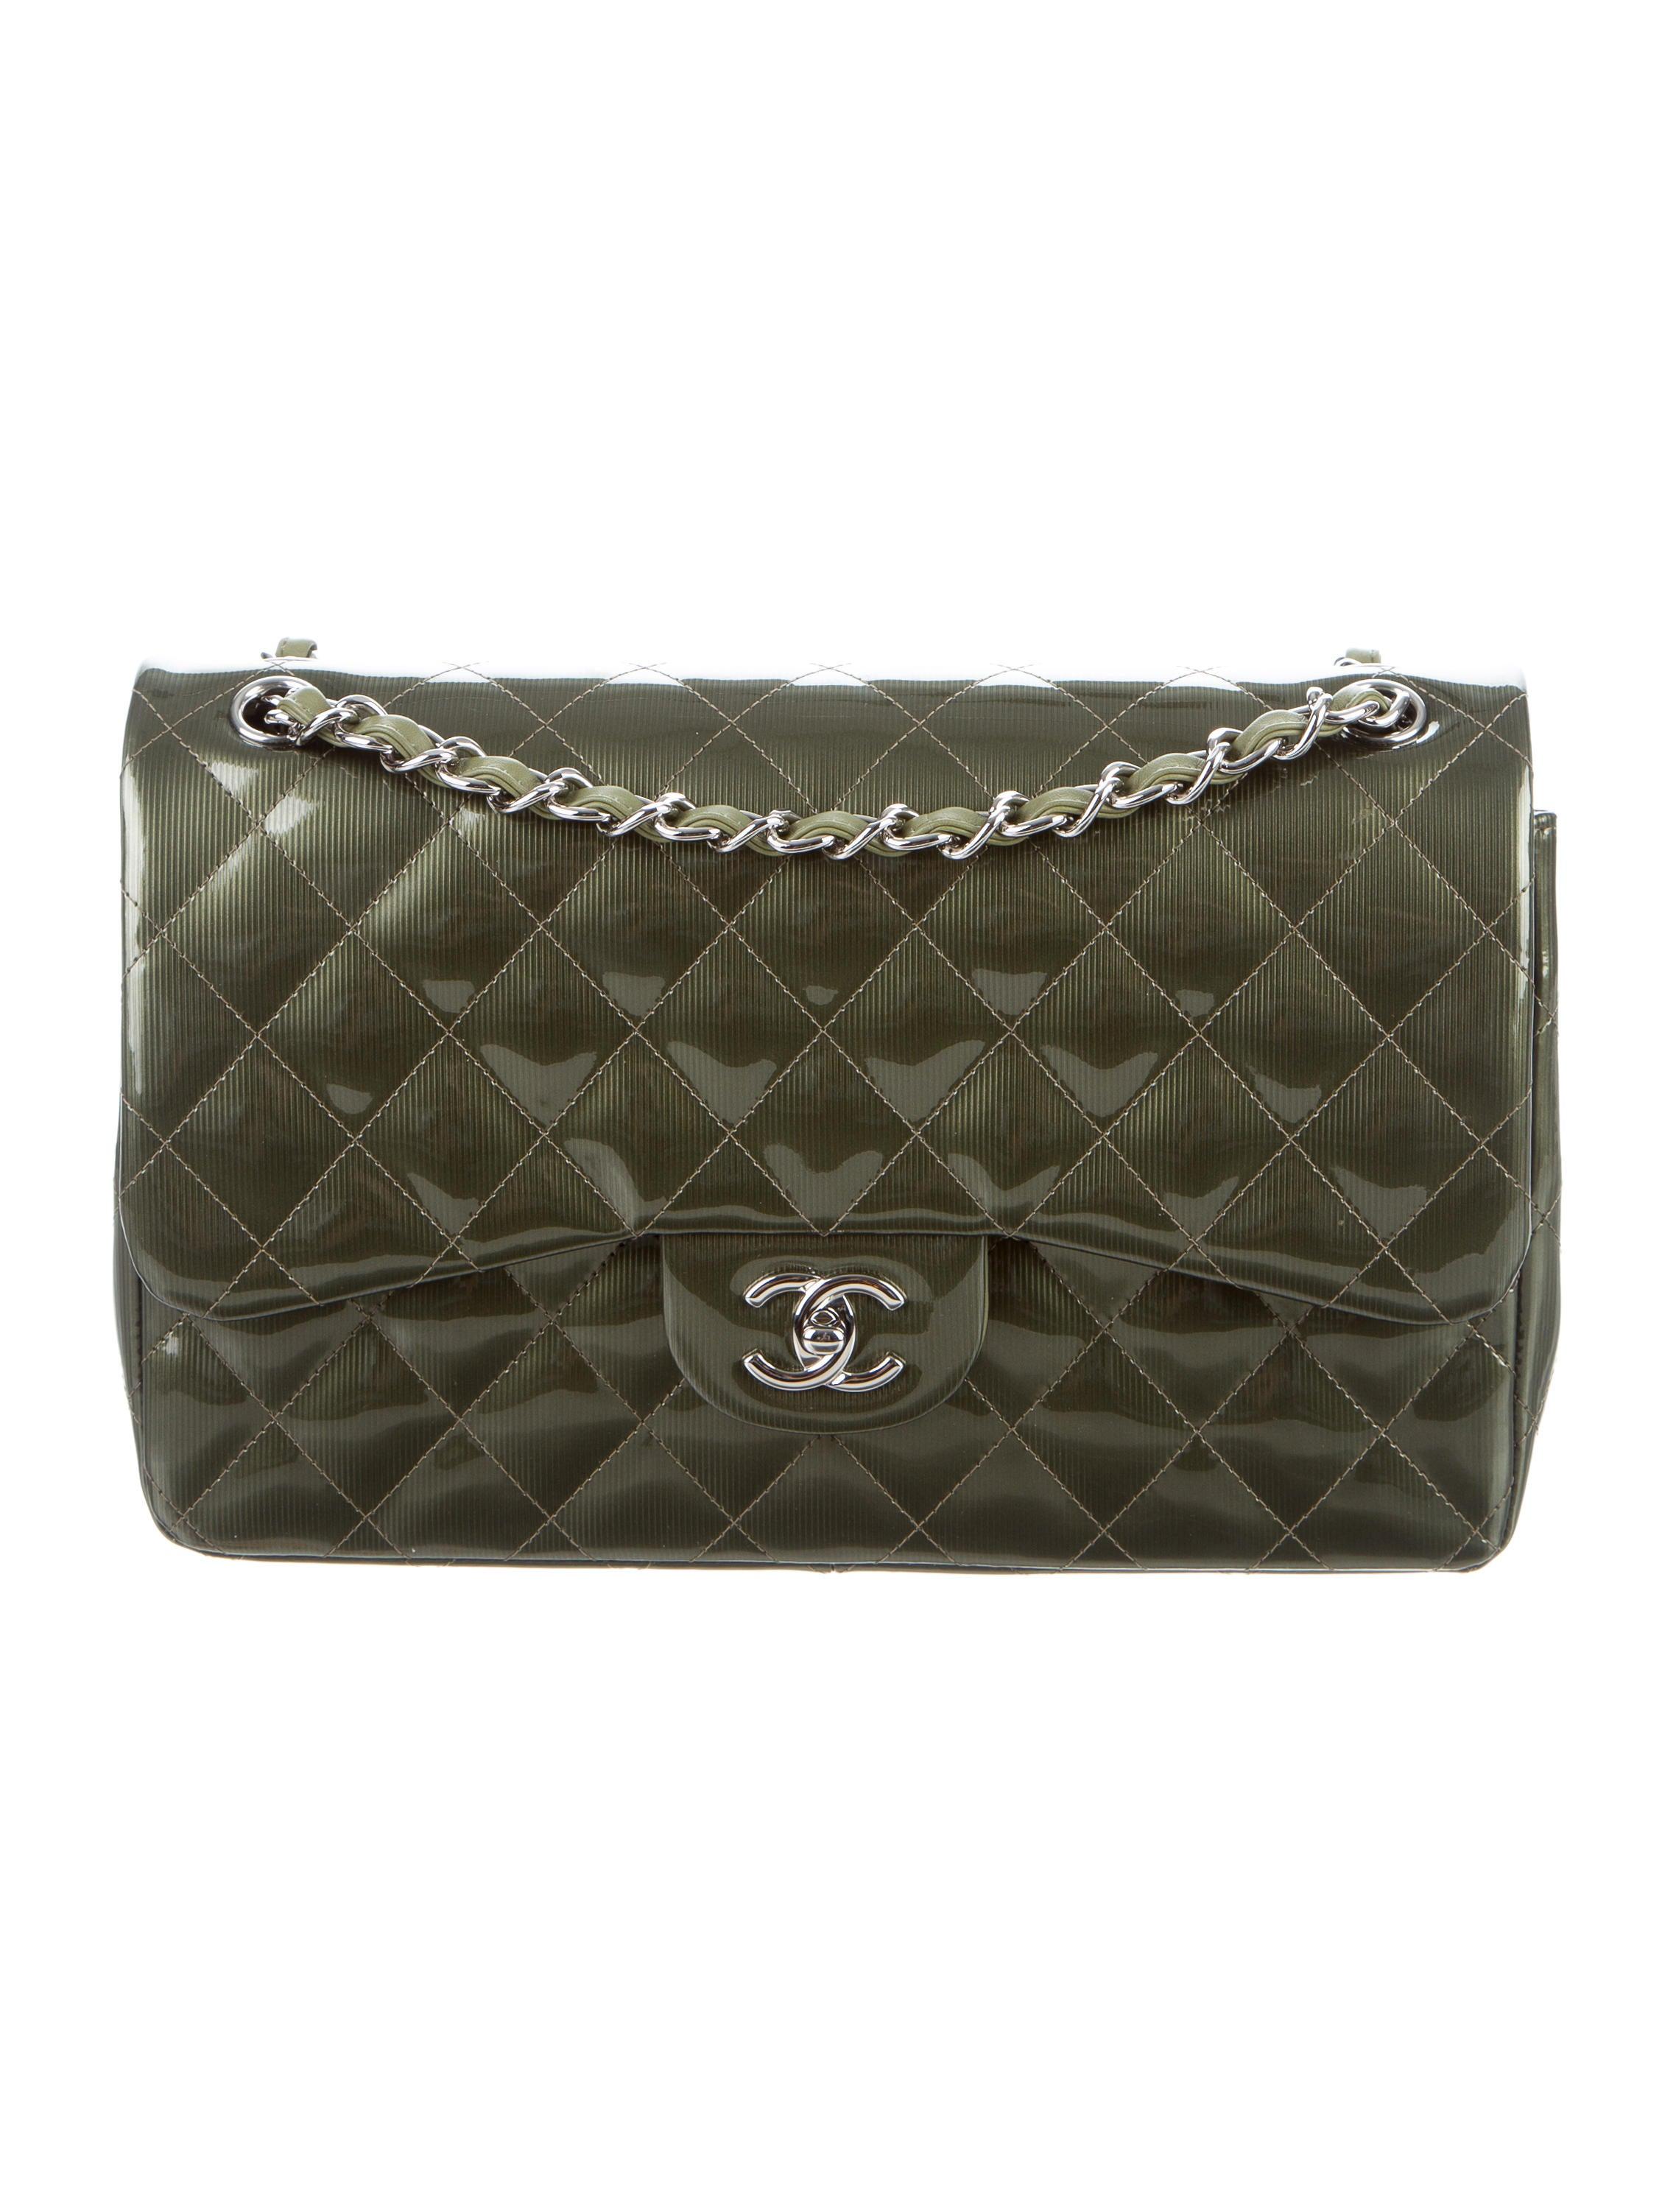 4f10818ef2ce Chanel Classic Flap Bag Green | Dr.Paul